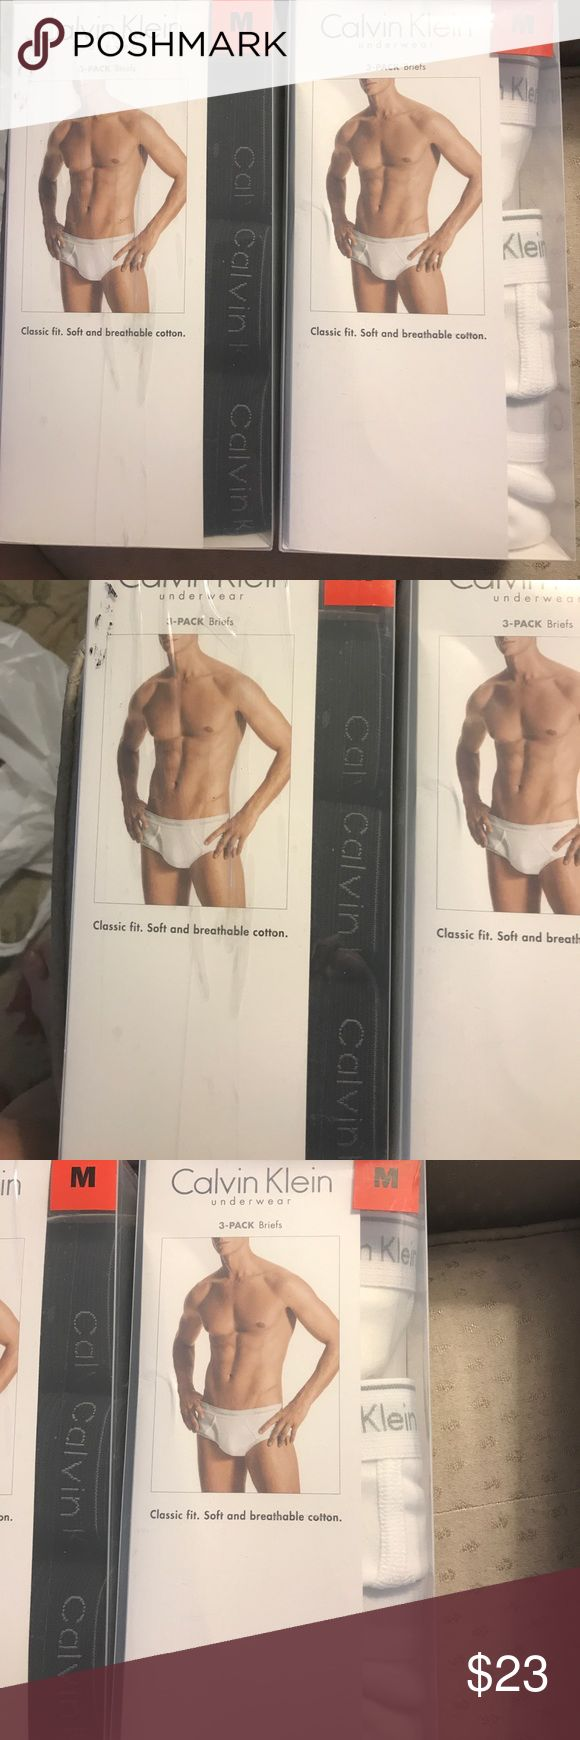 "NIB 3-pack Calvin Klein cotton briefs black Classic fit. Soft and breathable 100% cotton. Size Medium--32-34"". Calvin Klein Underwear Underwear & Socks Briefs"